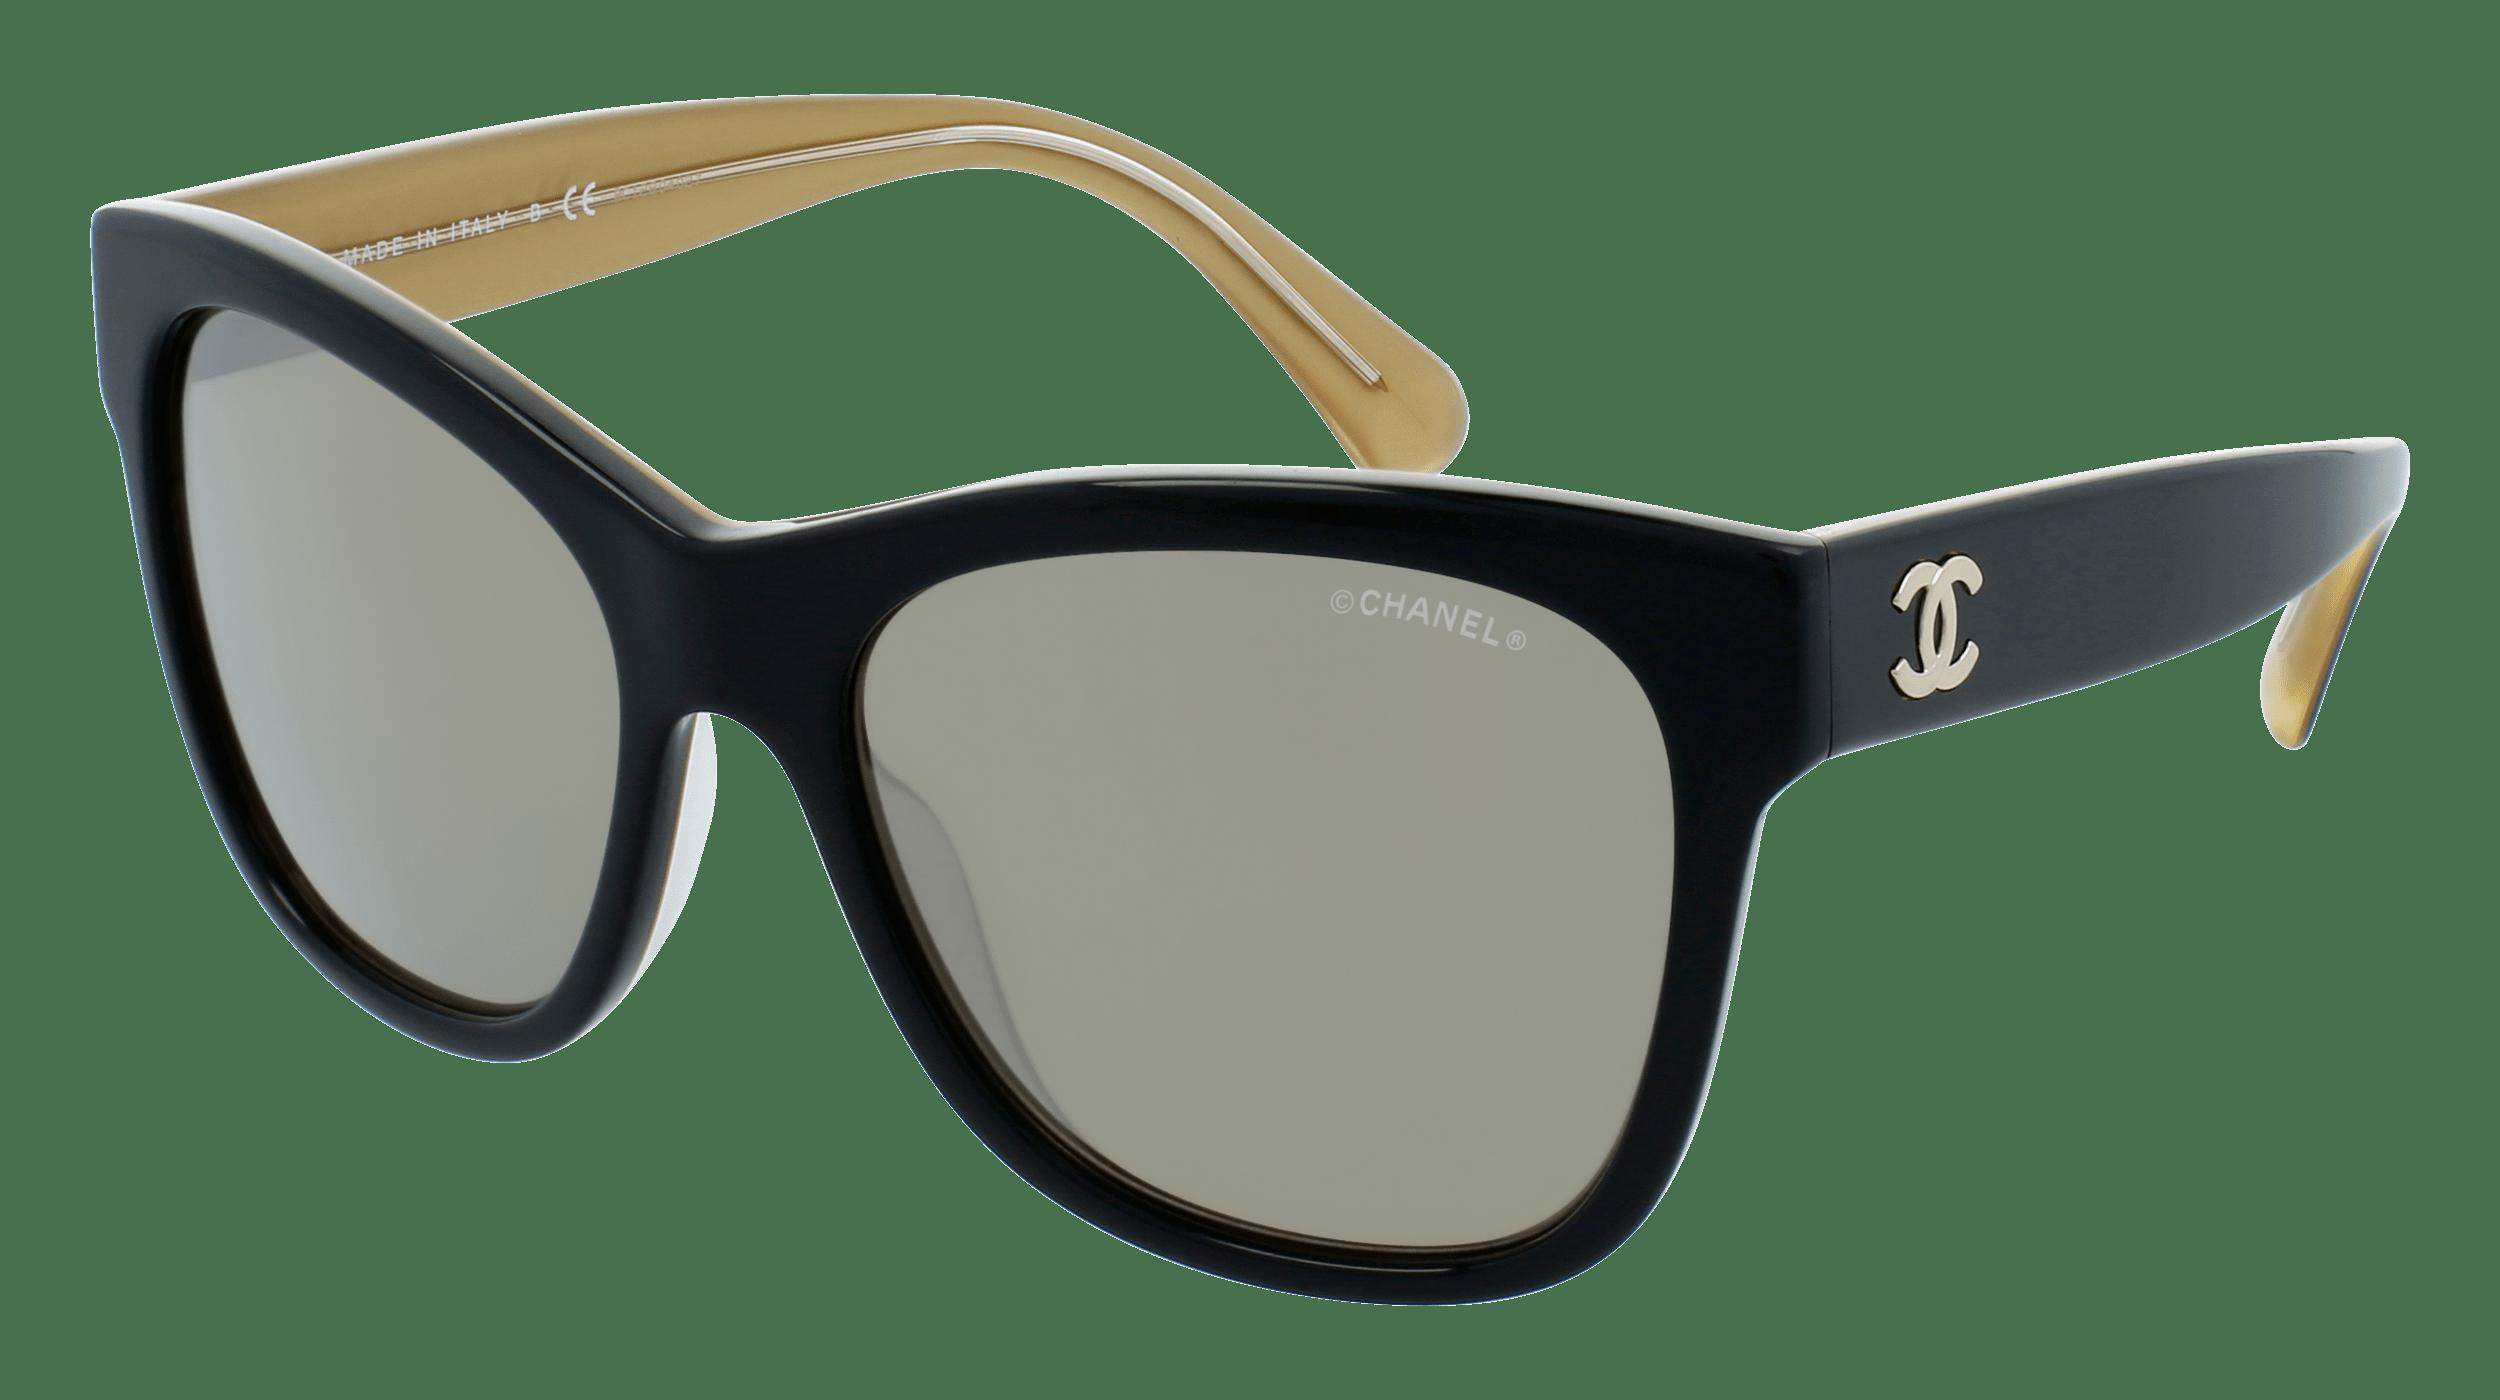 Chanel-CH5380